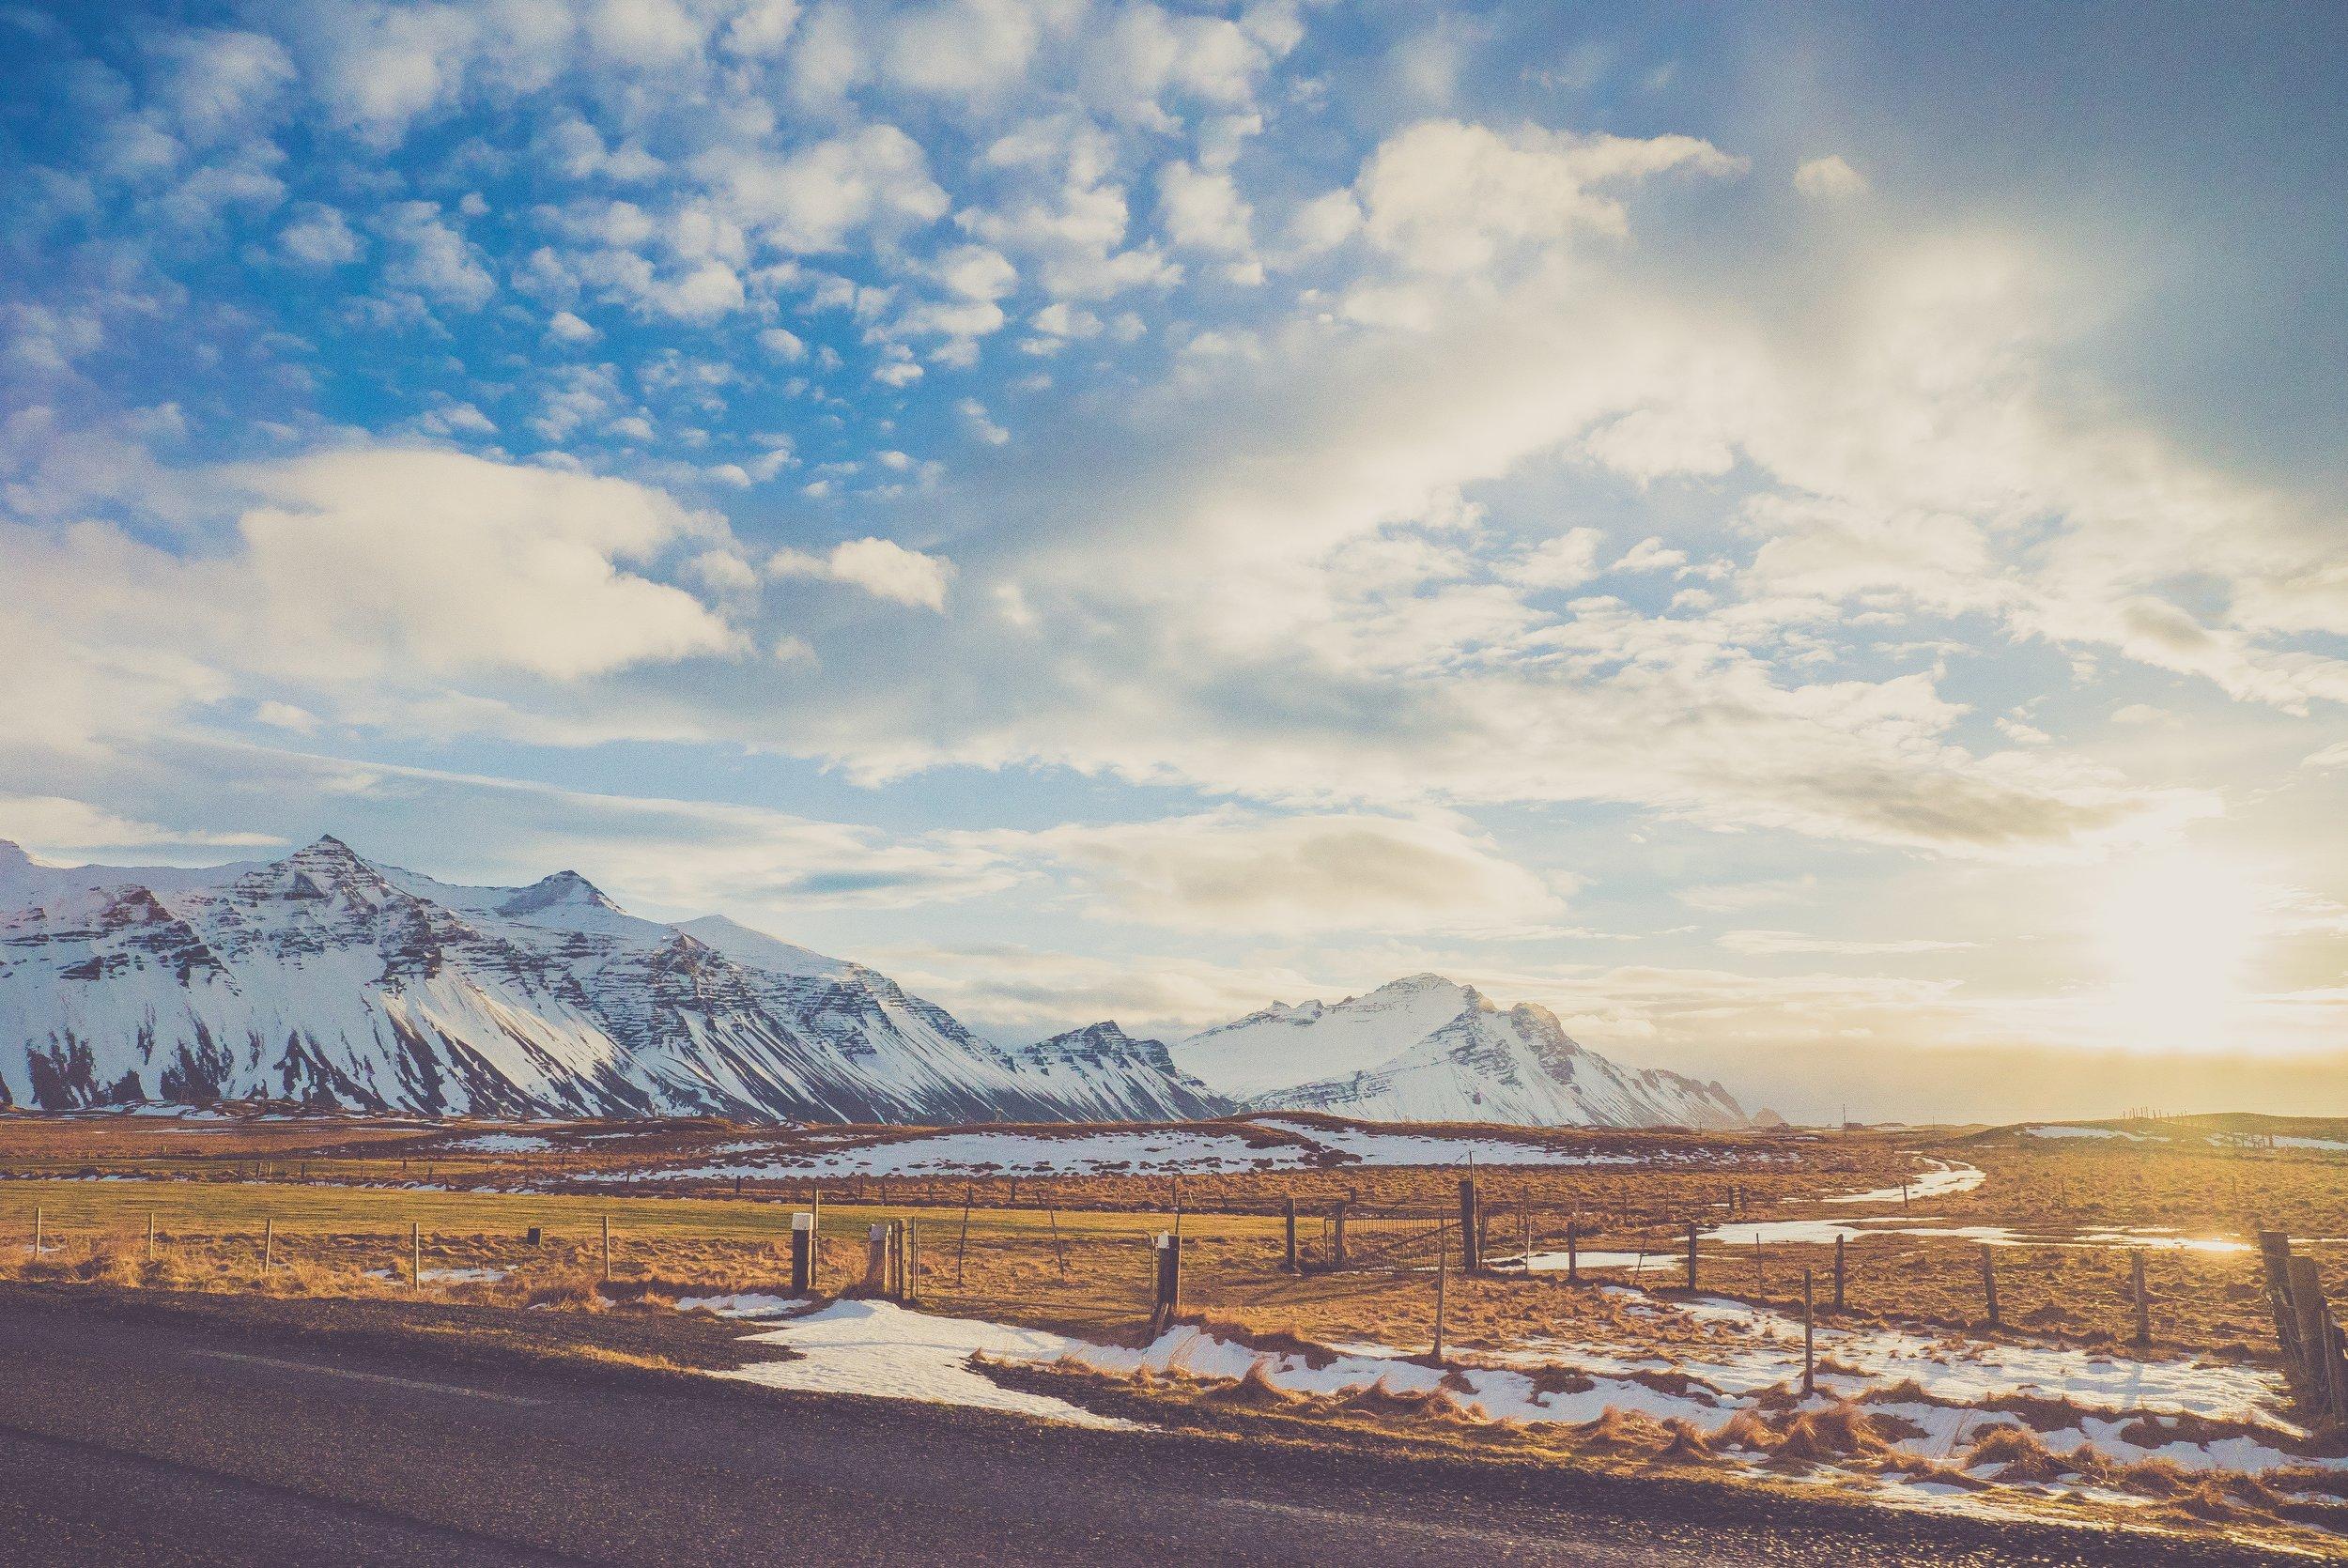 negative-space-vintage-snow-mountain-blue-sky-alexander-dummer.jpg